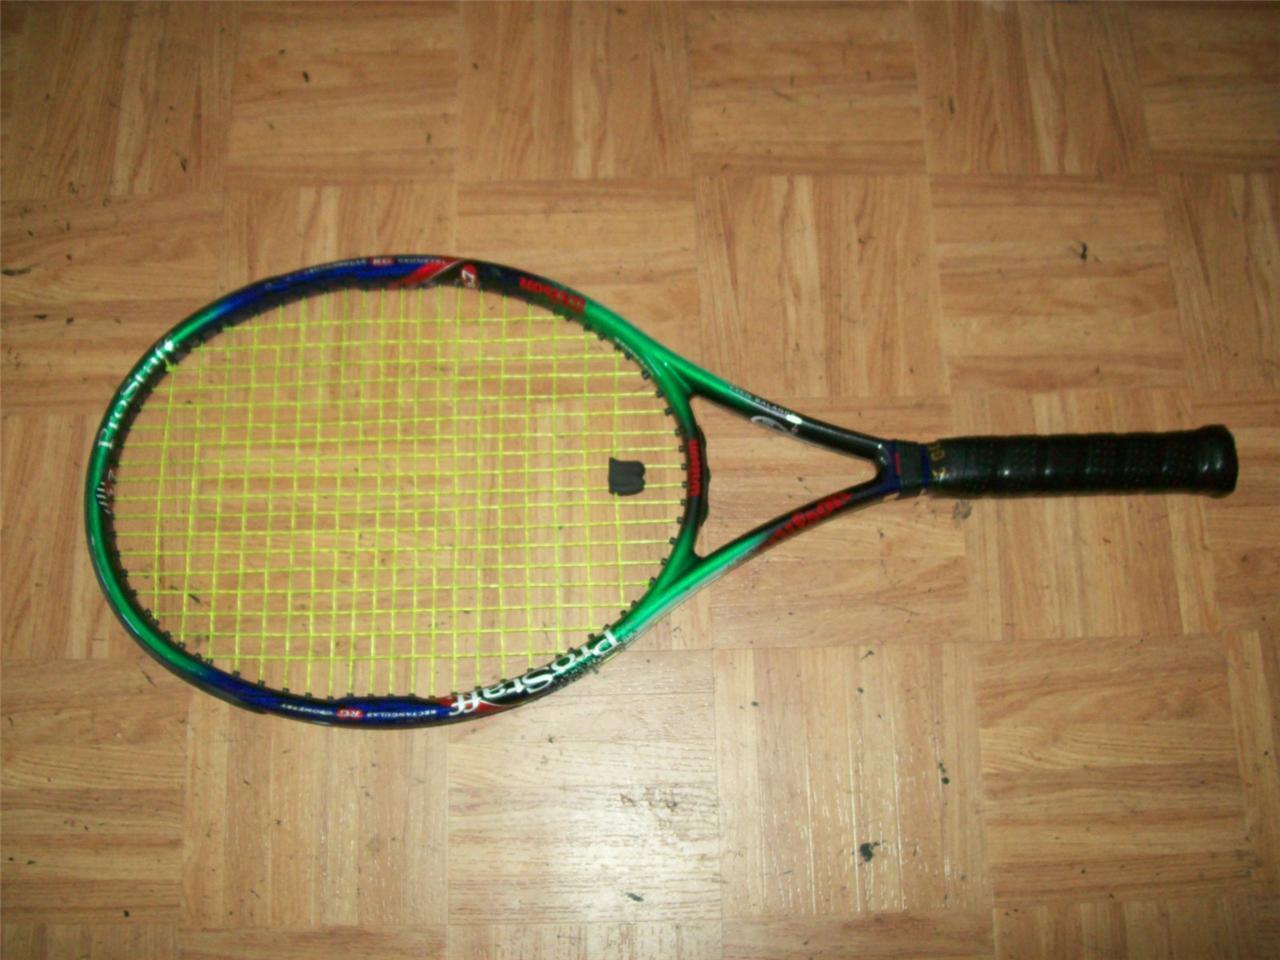 Wilson Pro Staff 6.7 EB OverTaille 110 4 3 8 Raquette de Tennis